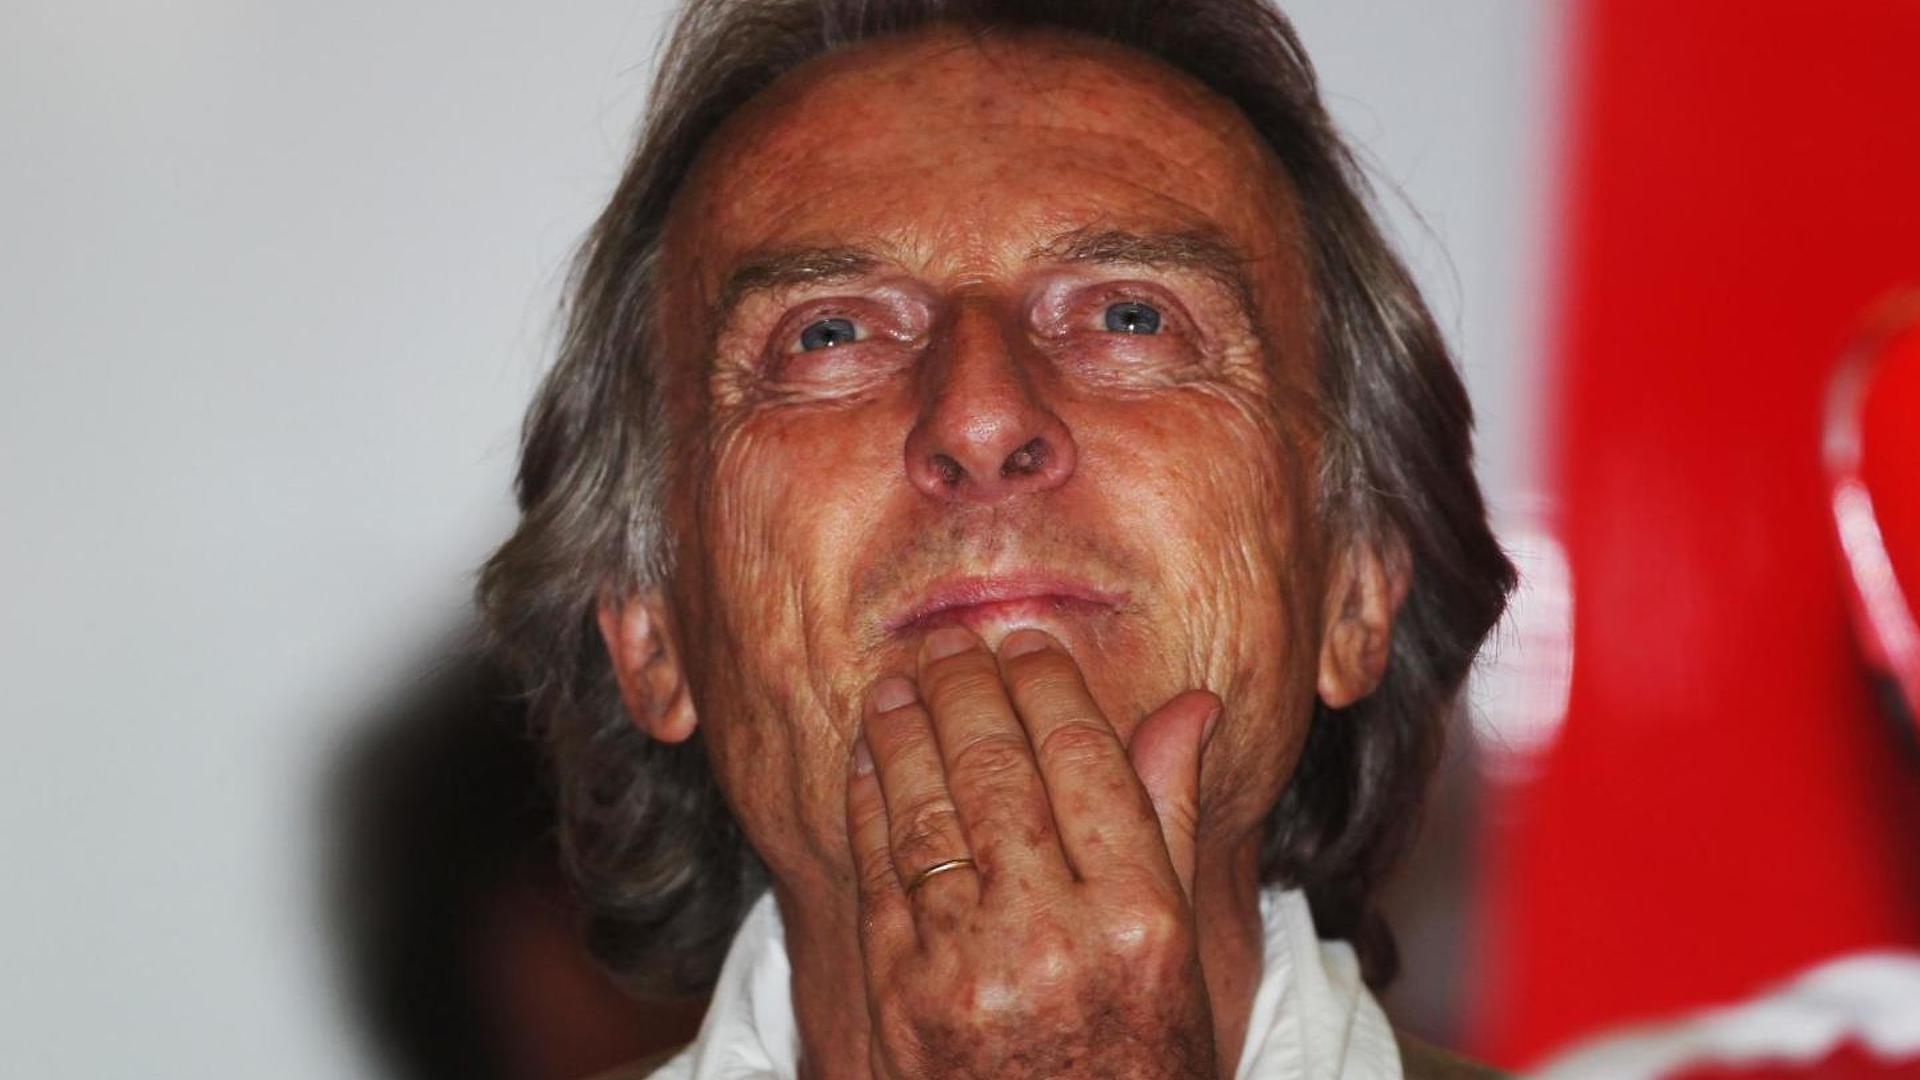 Montezemolo plays down 'excessive' rumours